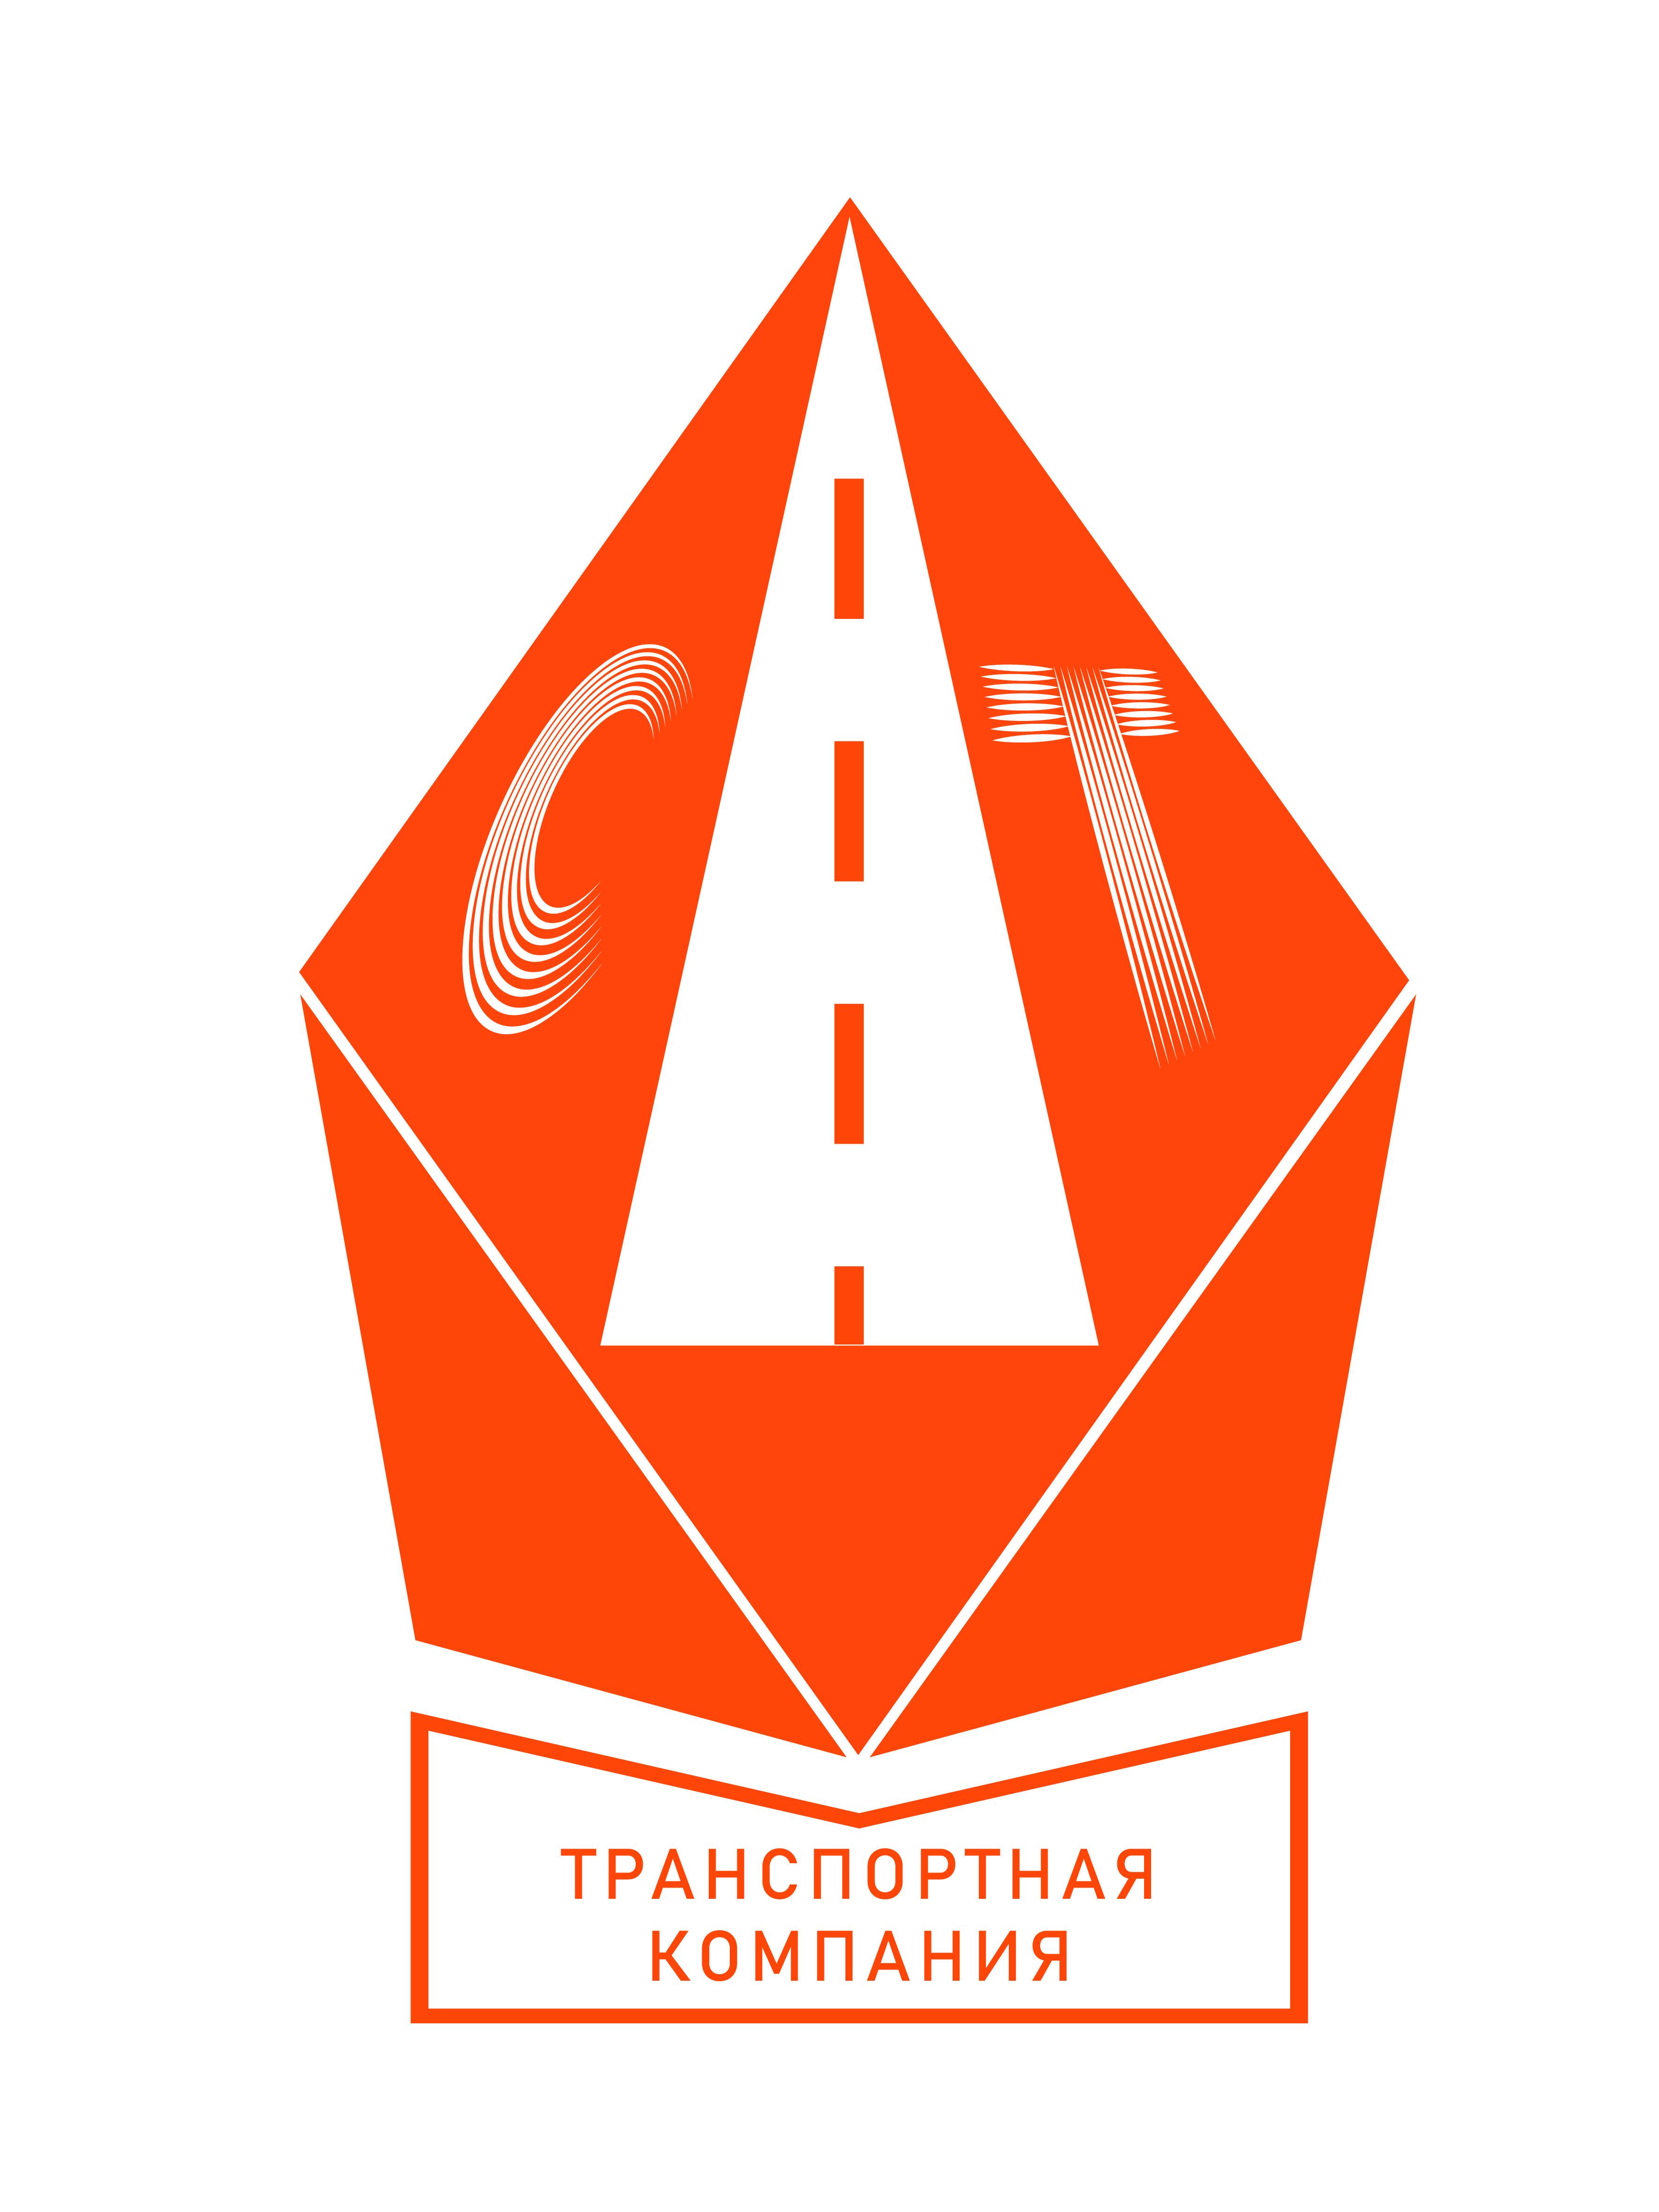 Разработка Логотипа транспортной компании фото f_3455e6dcbf61a06d.jpg